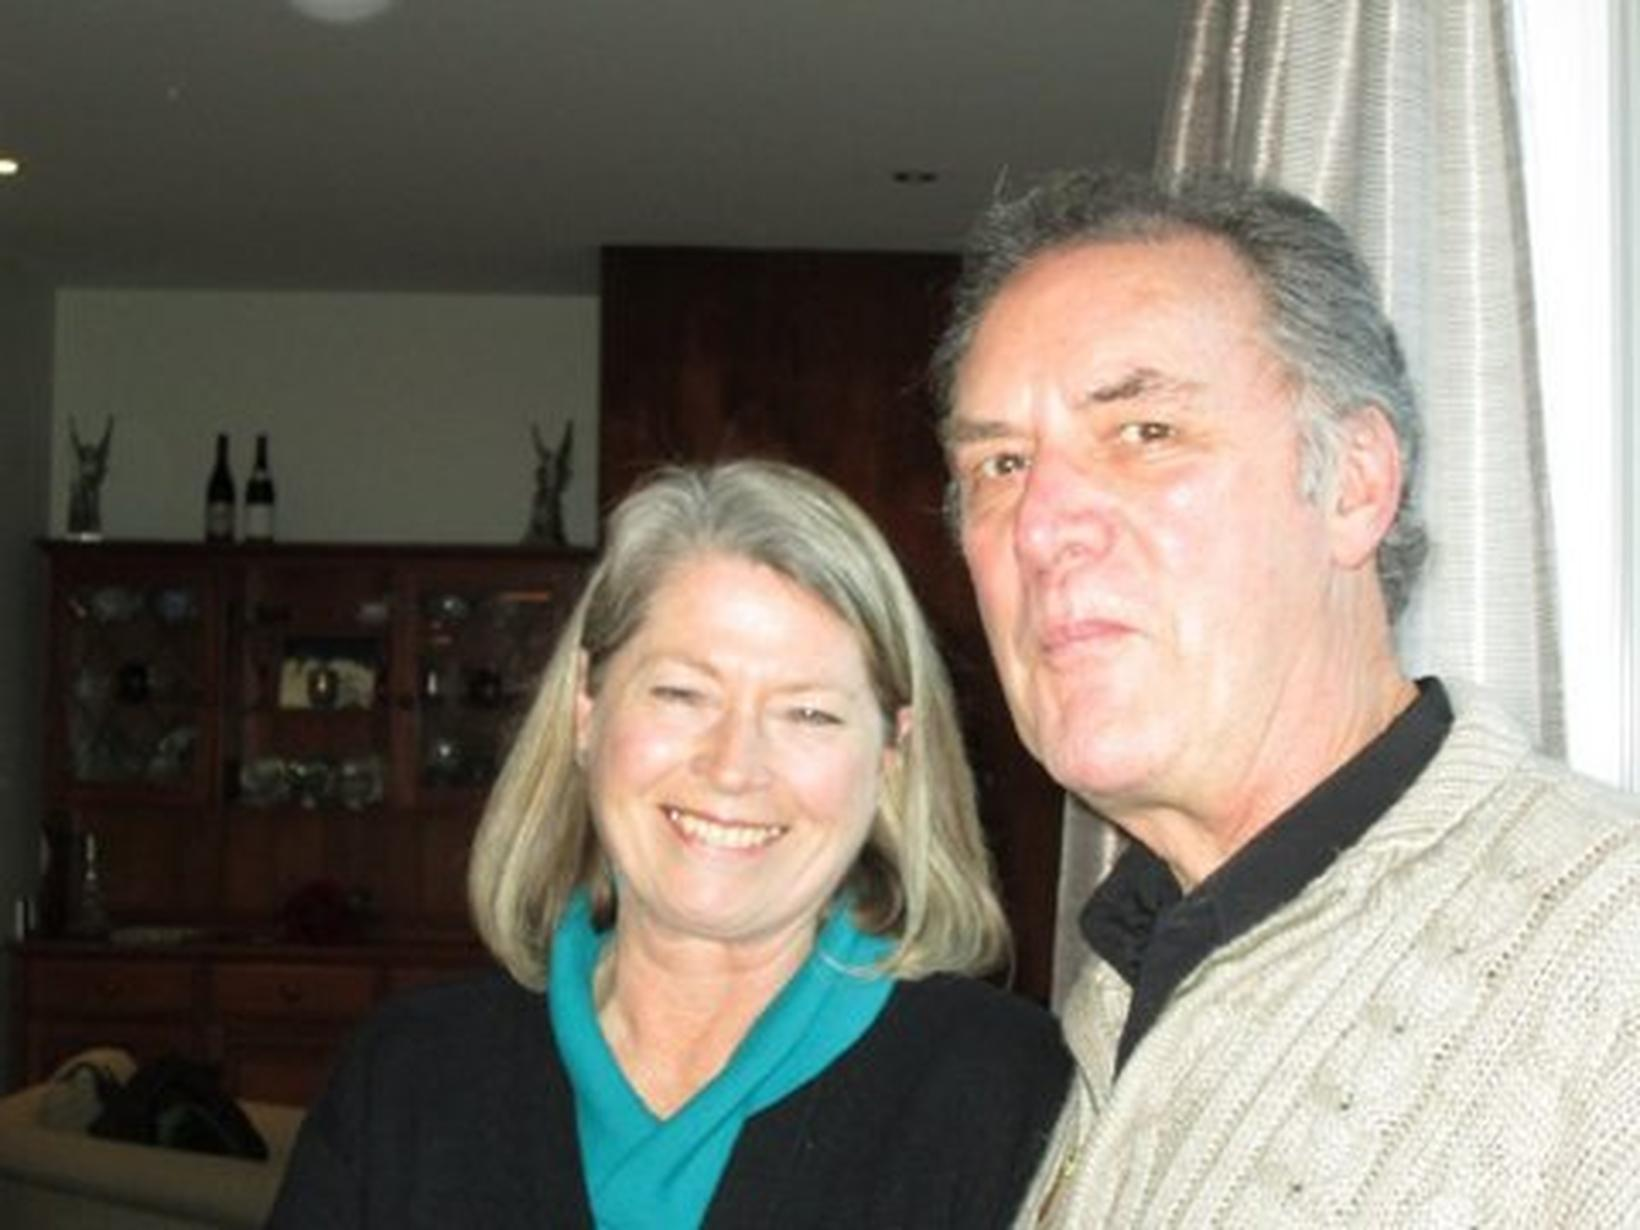 Steve & Jenny from Whakatane, New Zealand